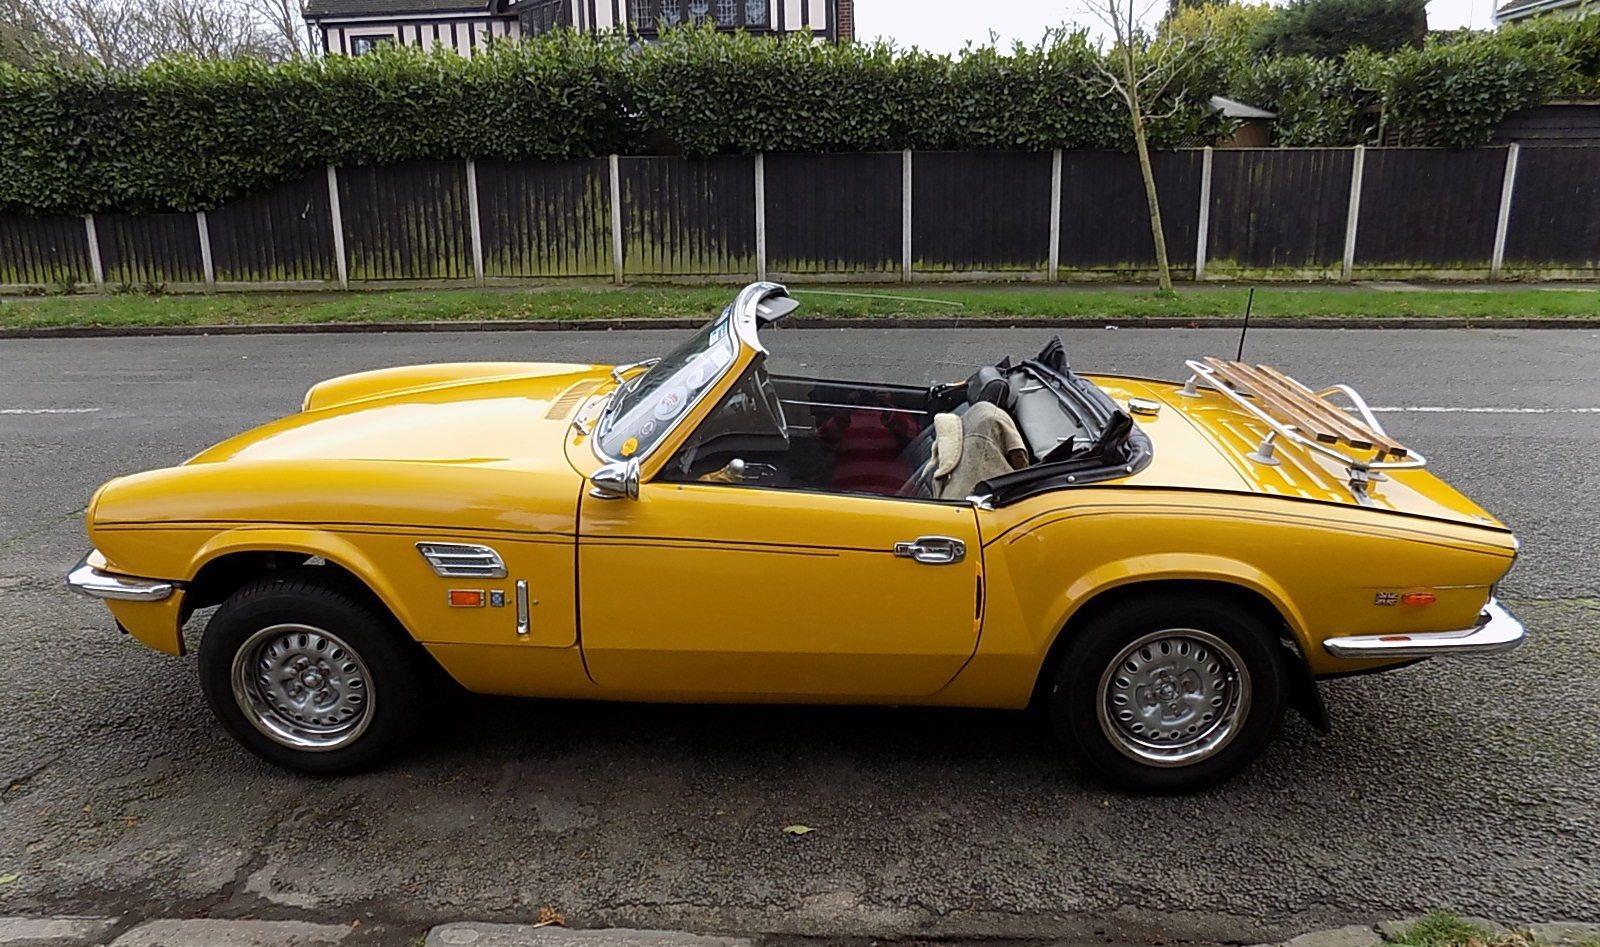 Alfie says Barrie Lane's Triumph Spitfire is a 'proper British classic sports car'